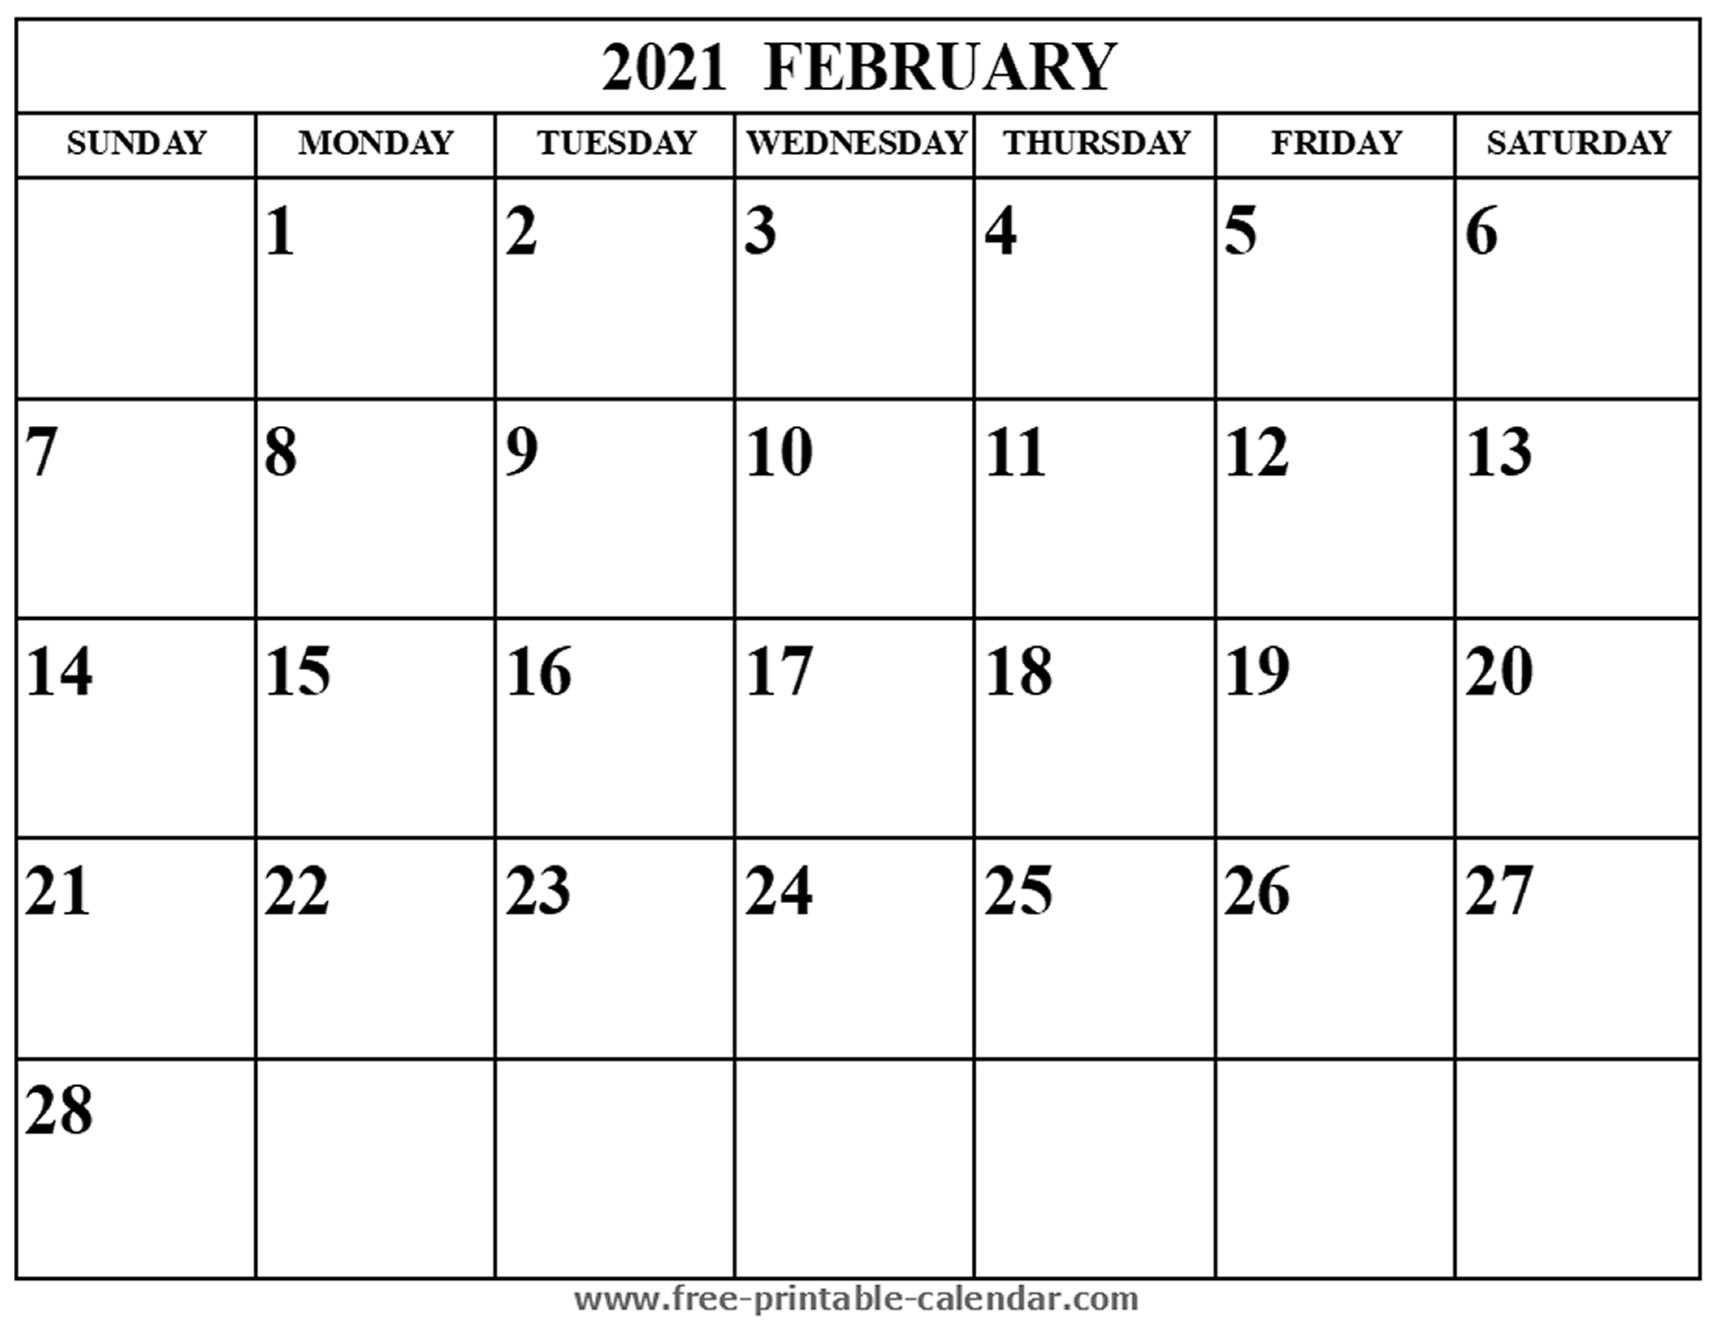 Blank February 2021 Calendar - Free-Printable-Calendar-Fill In Calendar January 2021